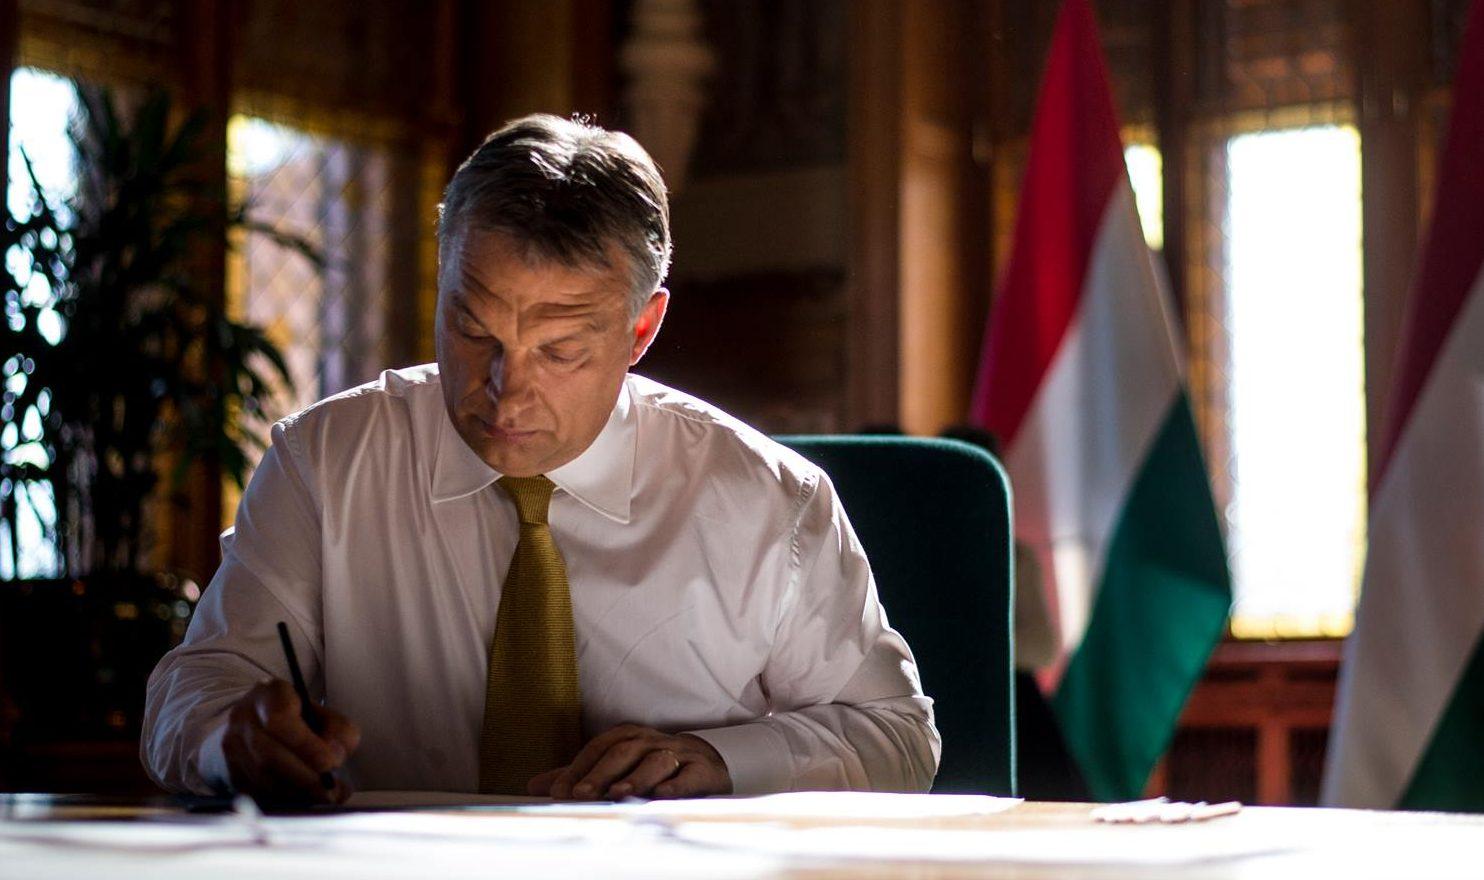 Orbán Congratulates Biden on Inauguration